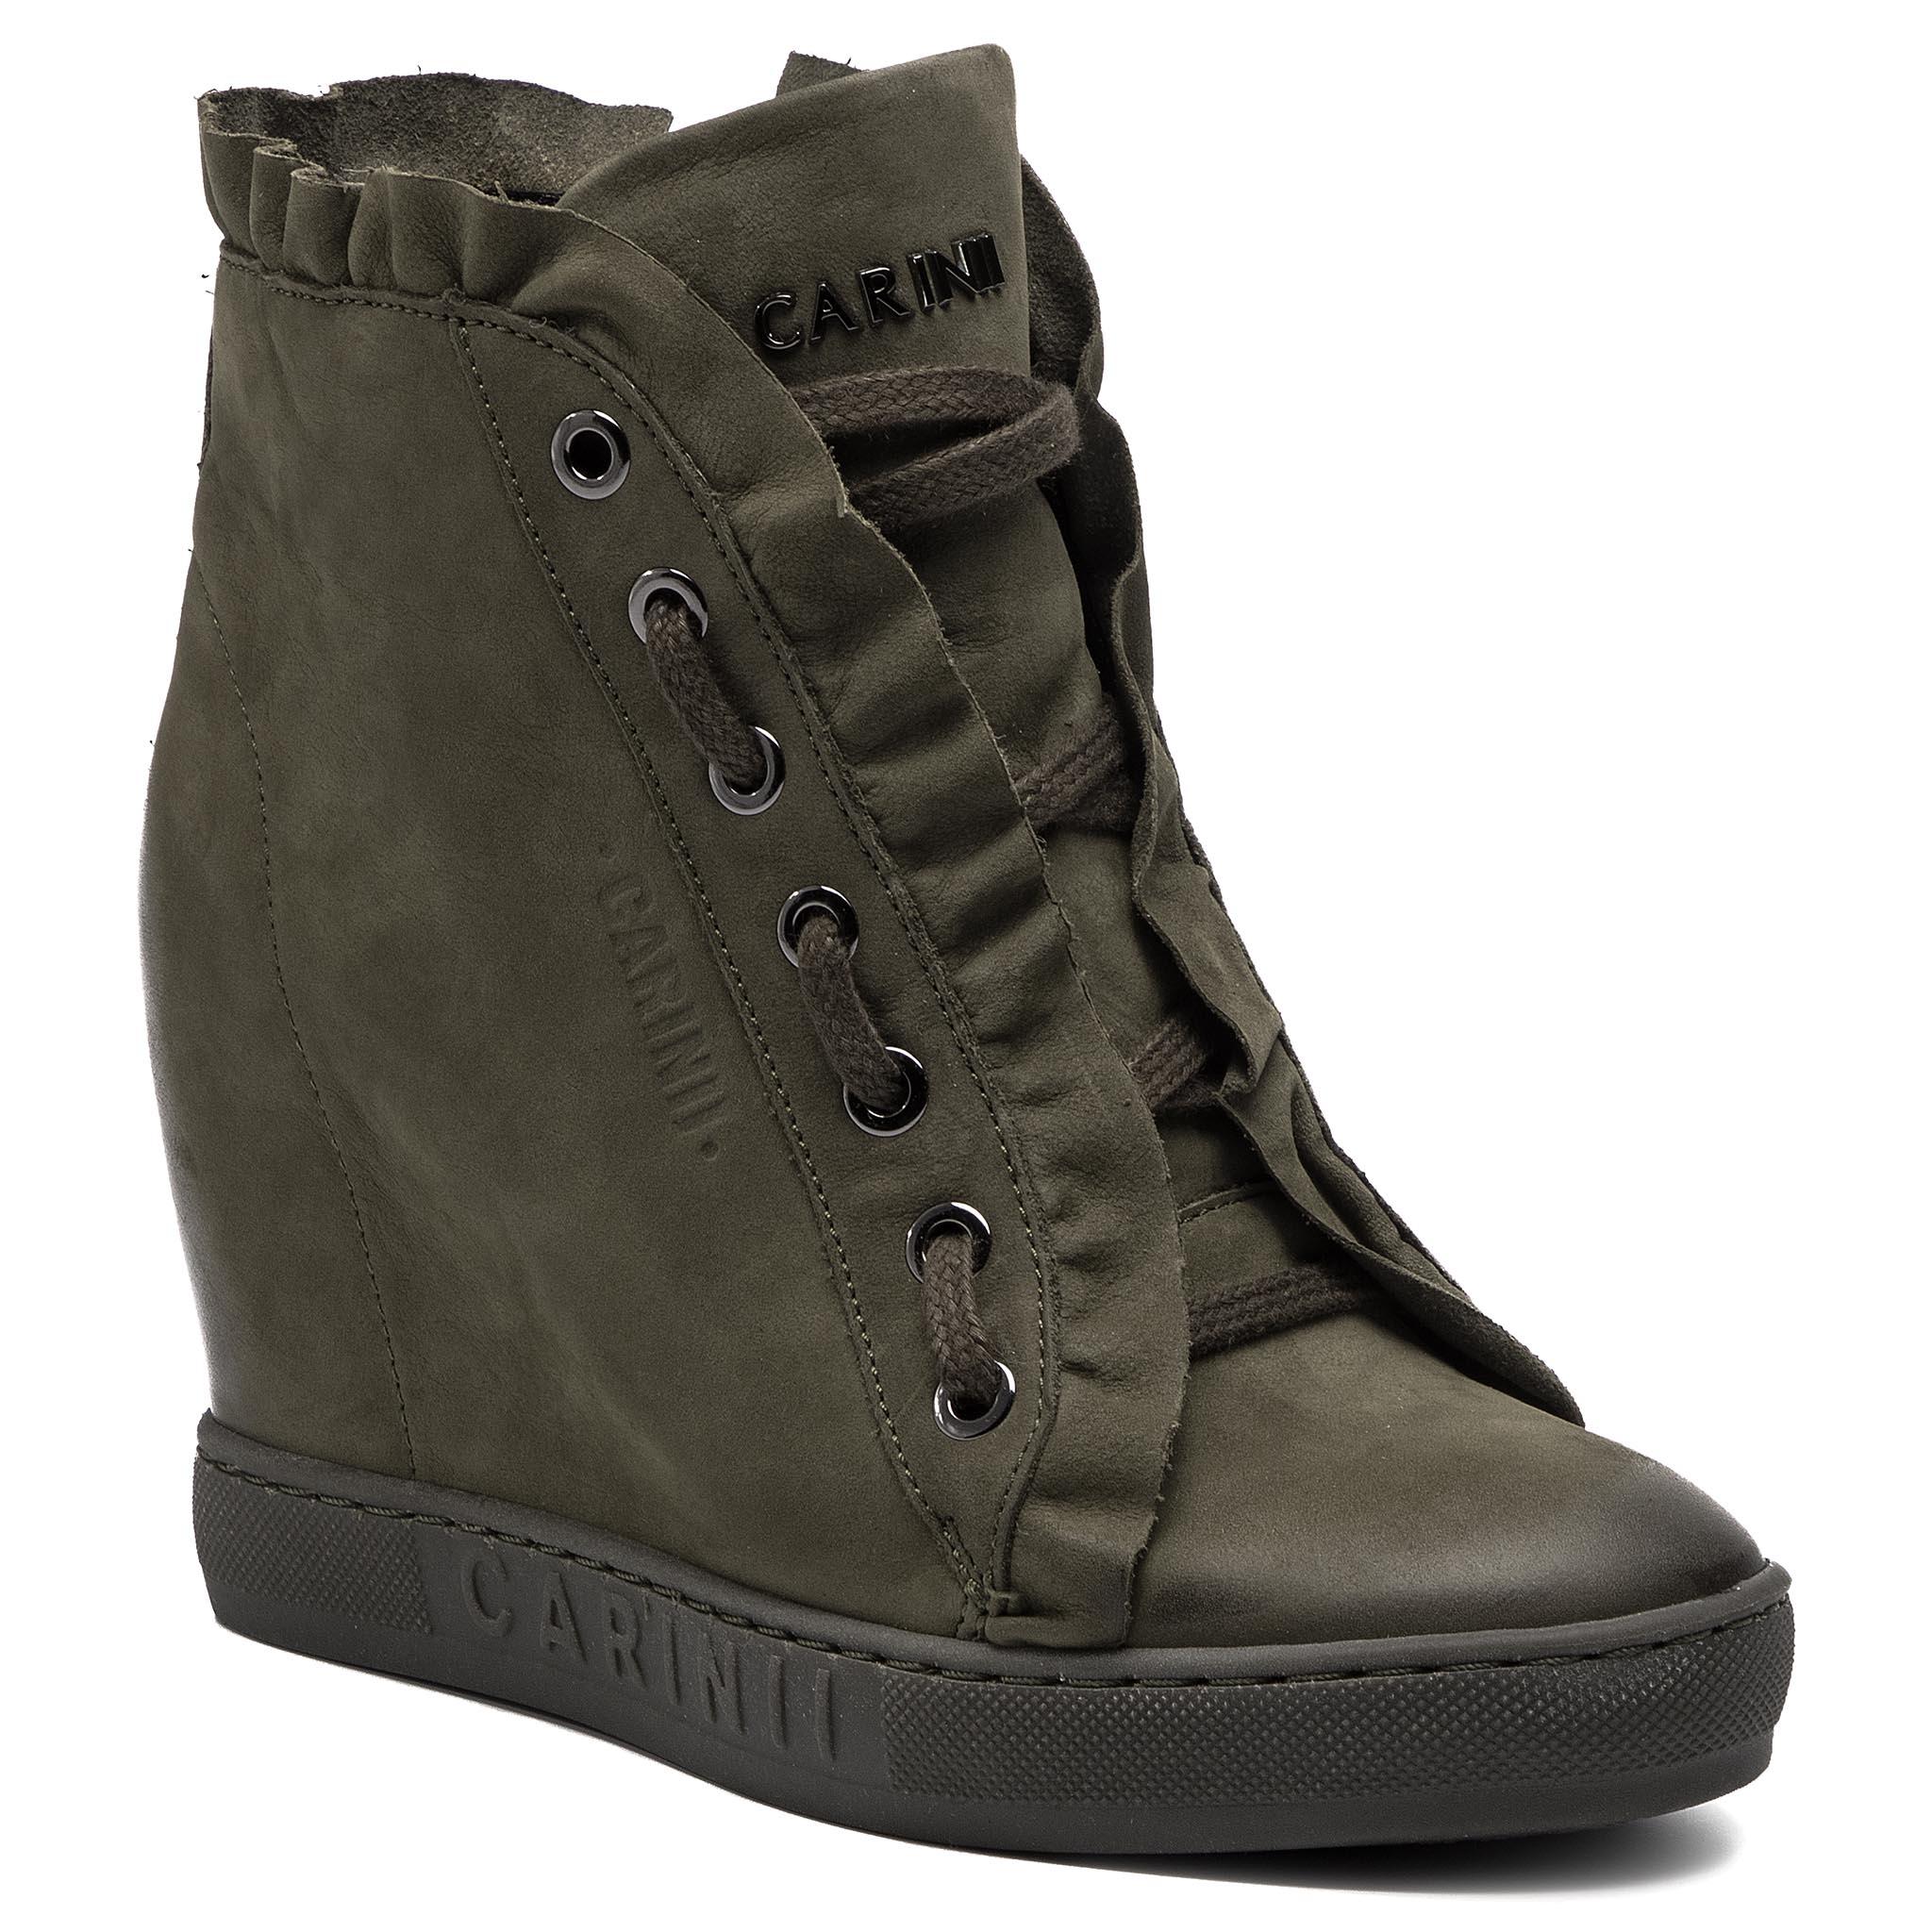 Czarna Iris Baldowski W00549 Czarnalycra 0046 002 Skóra Sneakers VpqSGUMjLz